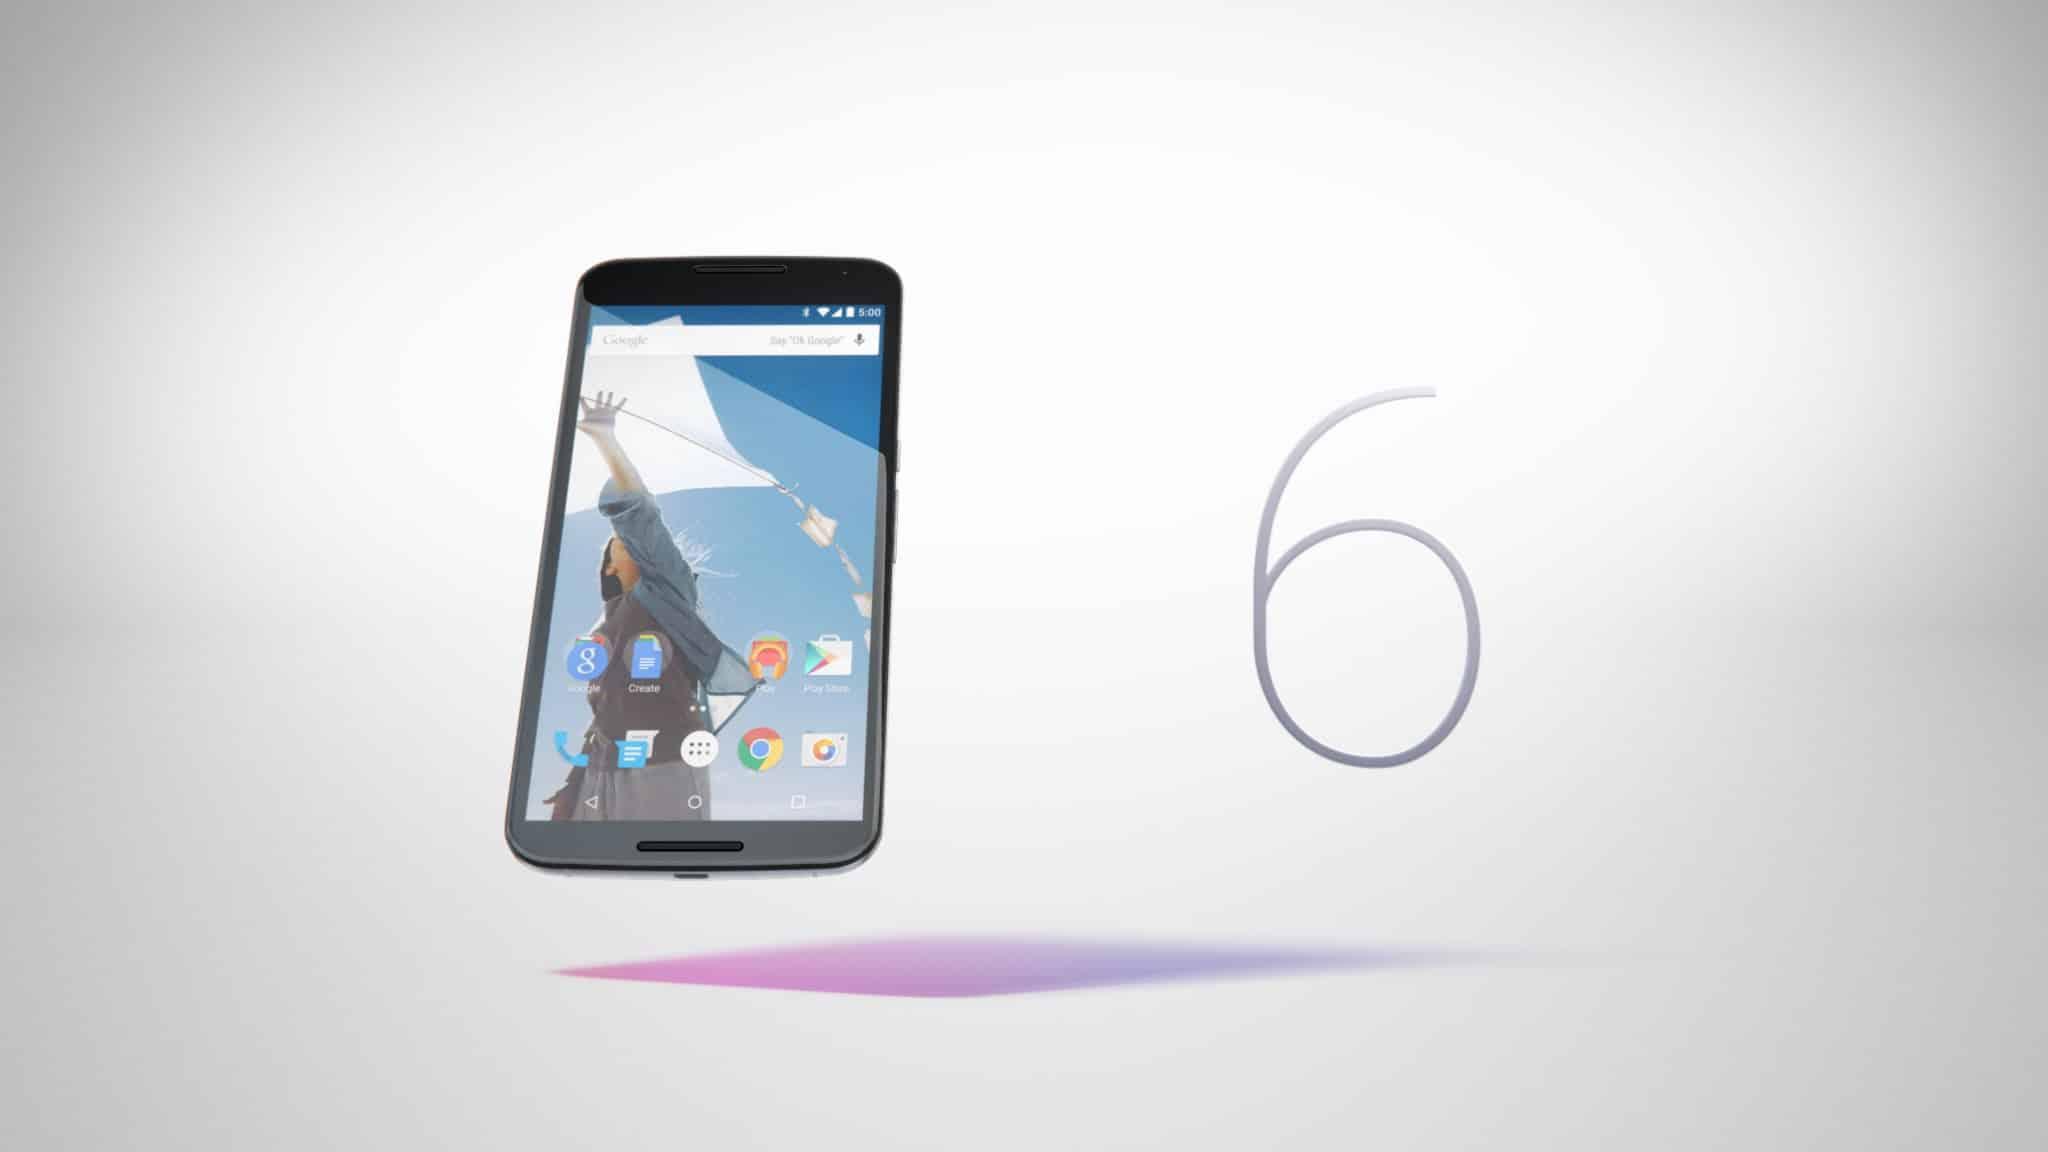 maxresdefault مراجعة الهاتف Nexus 6 : منافس جالكسي نوت 4